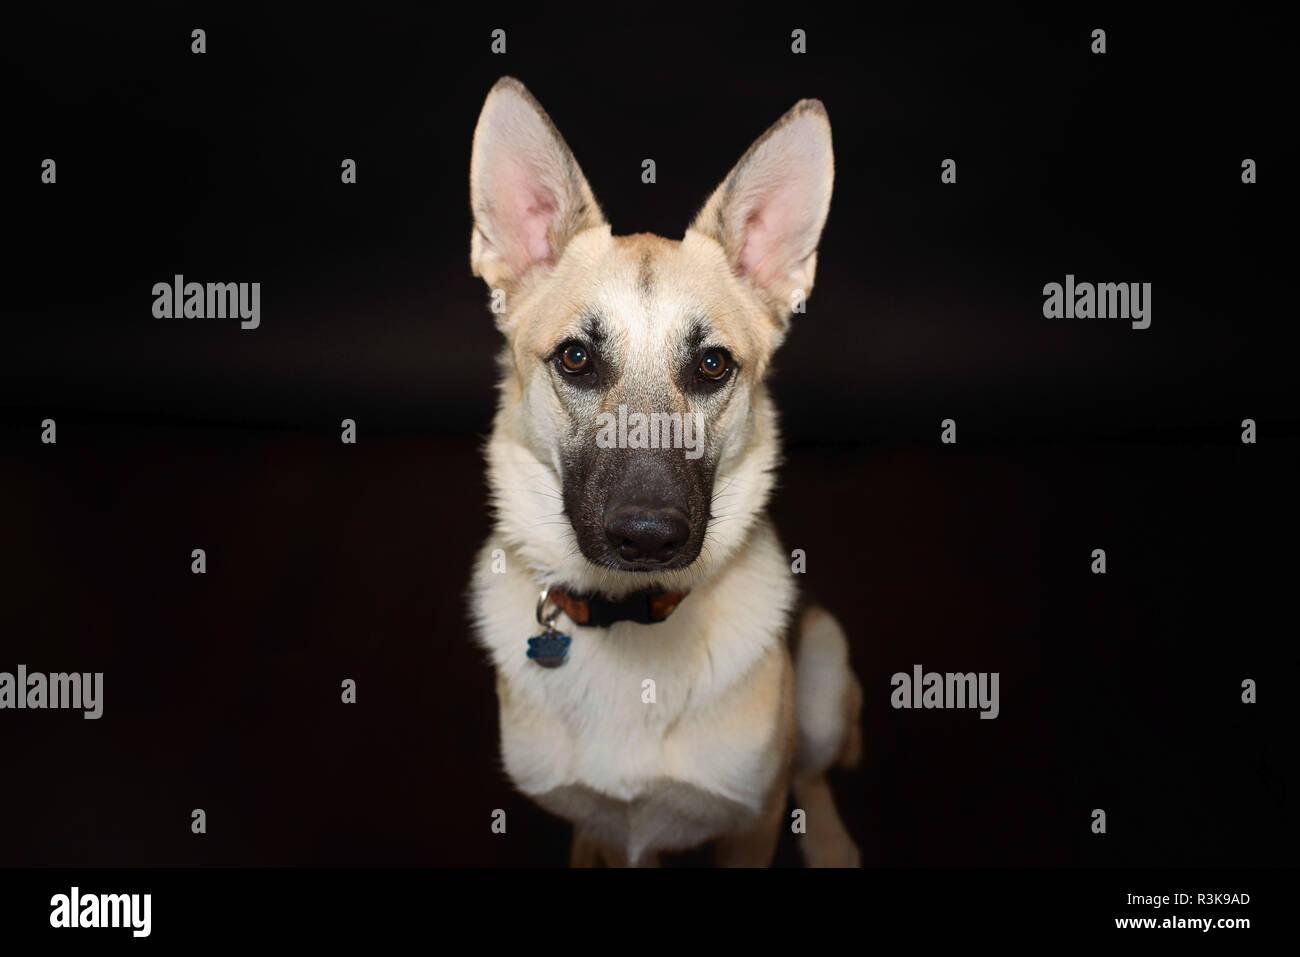 Studio Pet Portrait of a Beautiful Young German Shepherd Dog in Studio against a Black Backdrop. - Stock Image